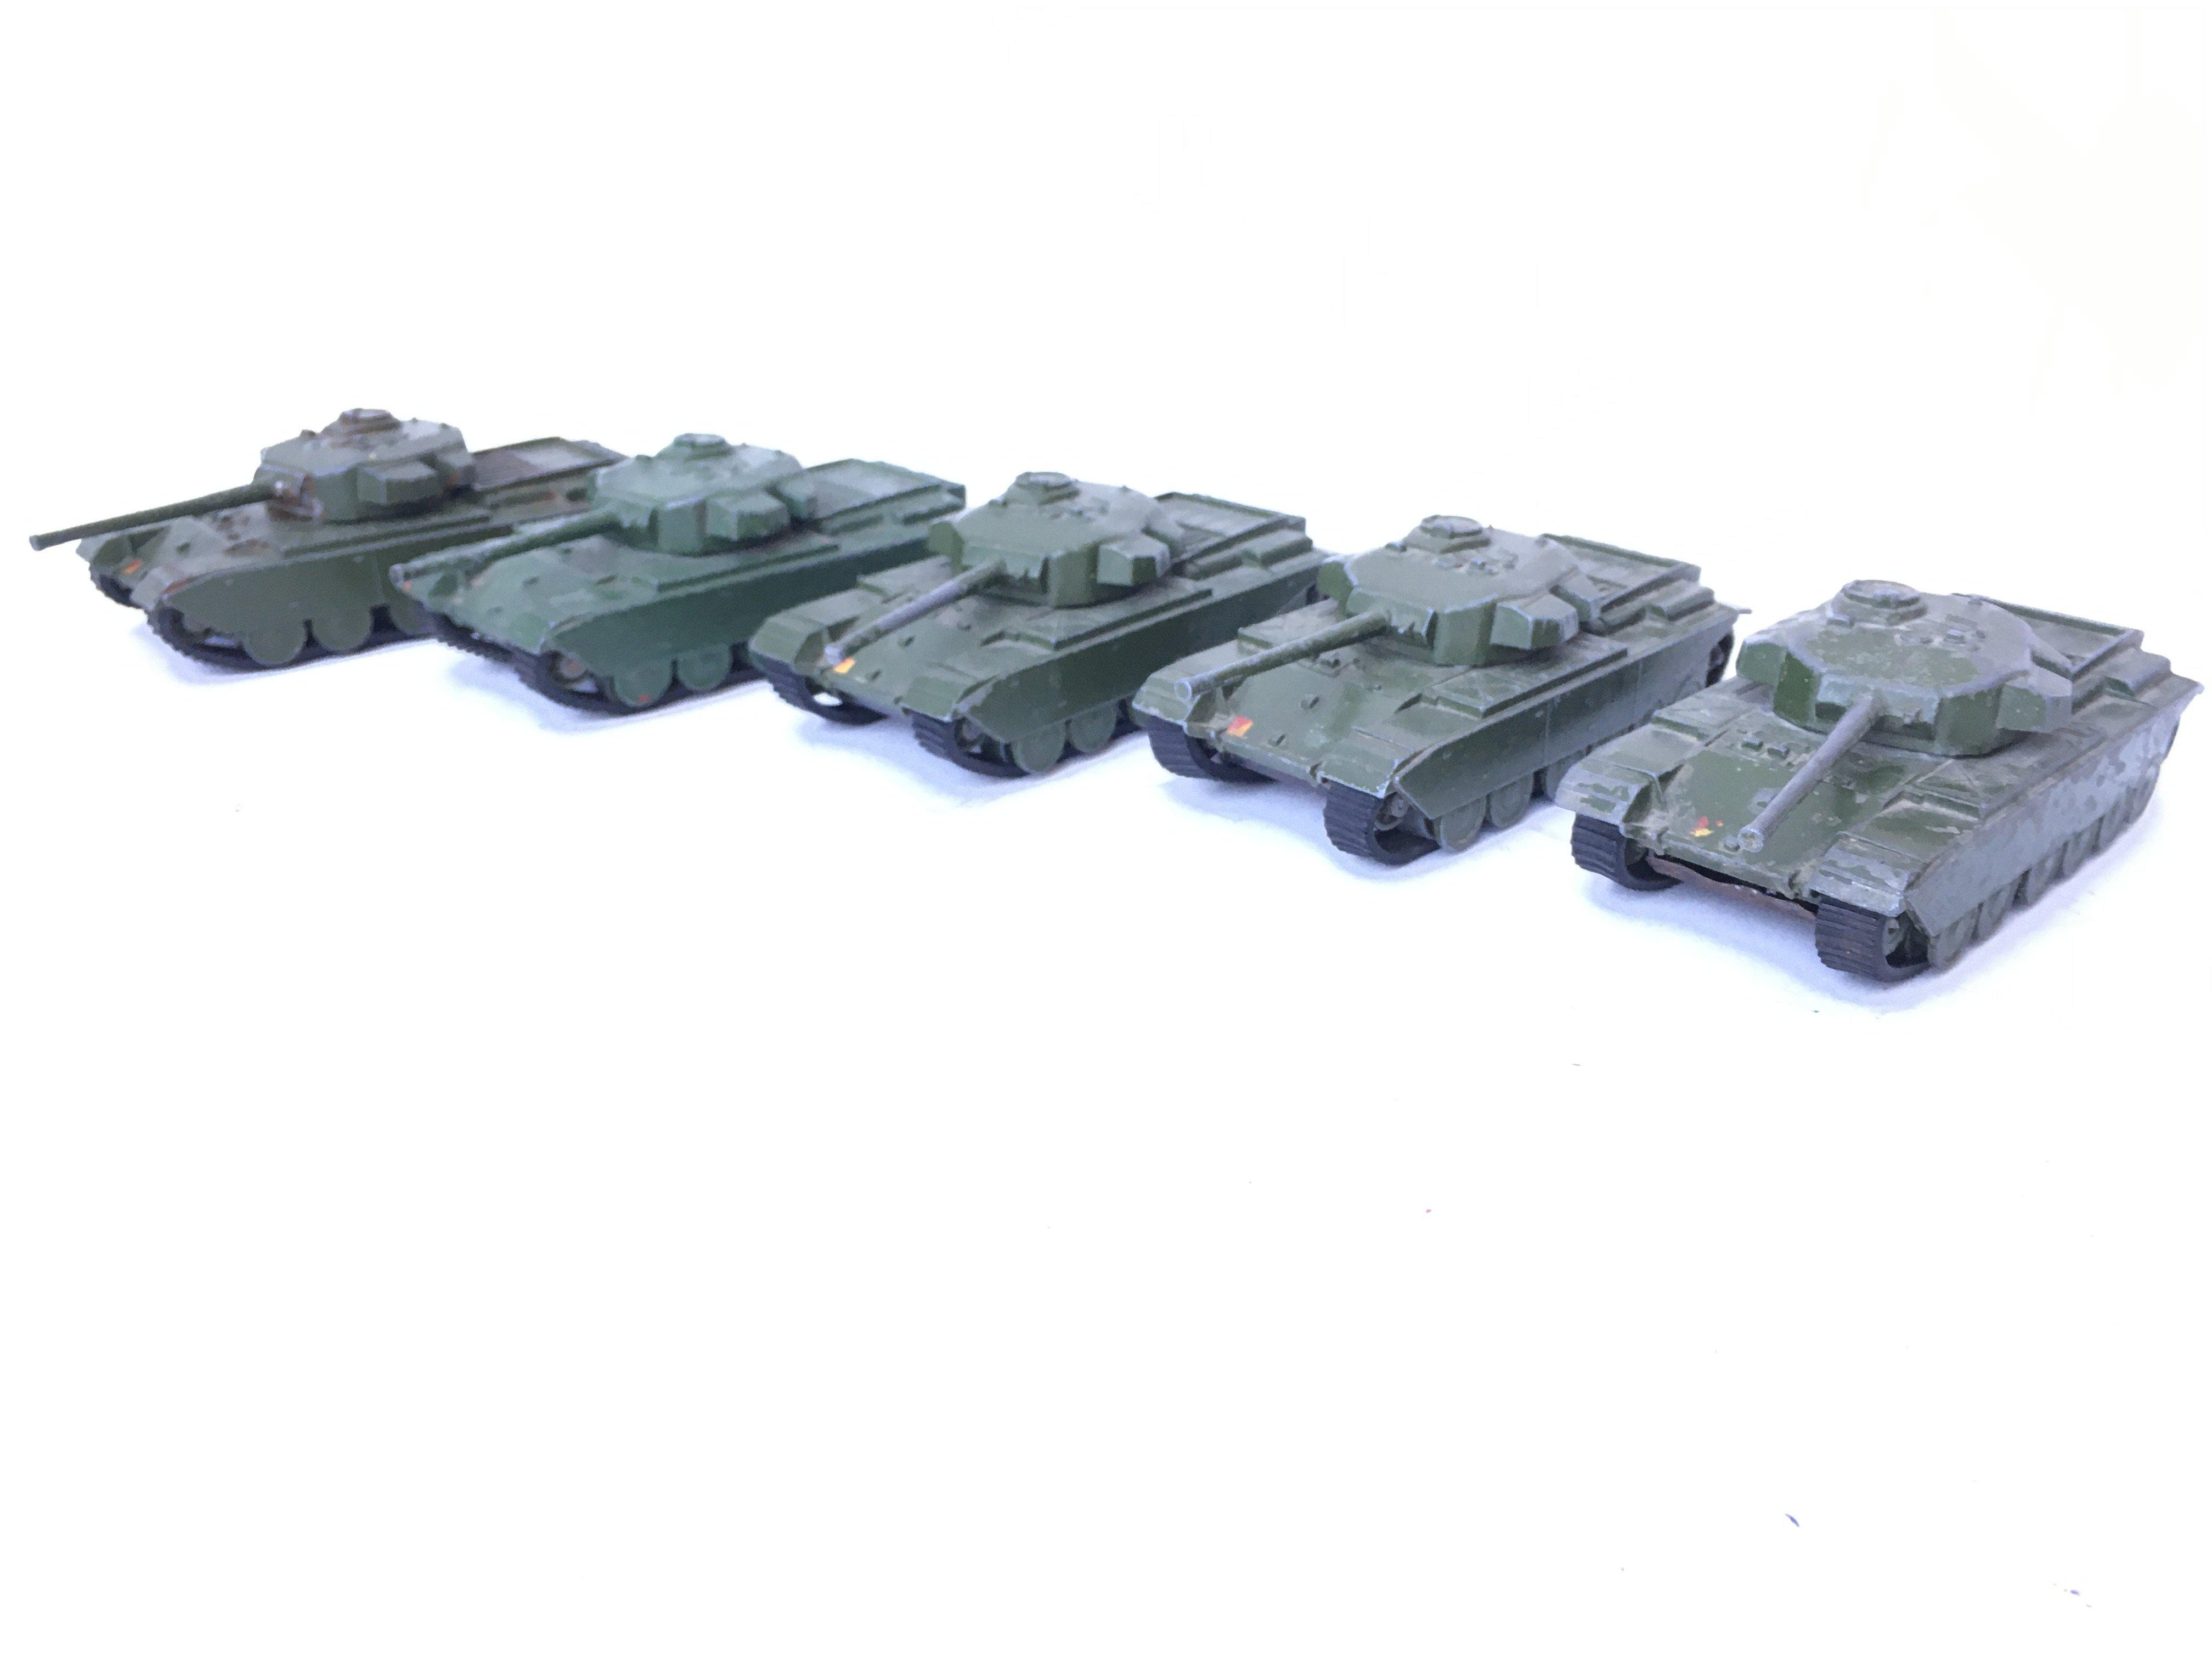 5 X Dinky Supertoys Centurion Tanks. #651.(1 re-pa - Image 2 of 4